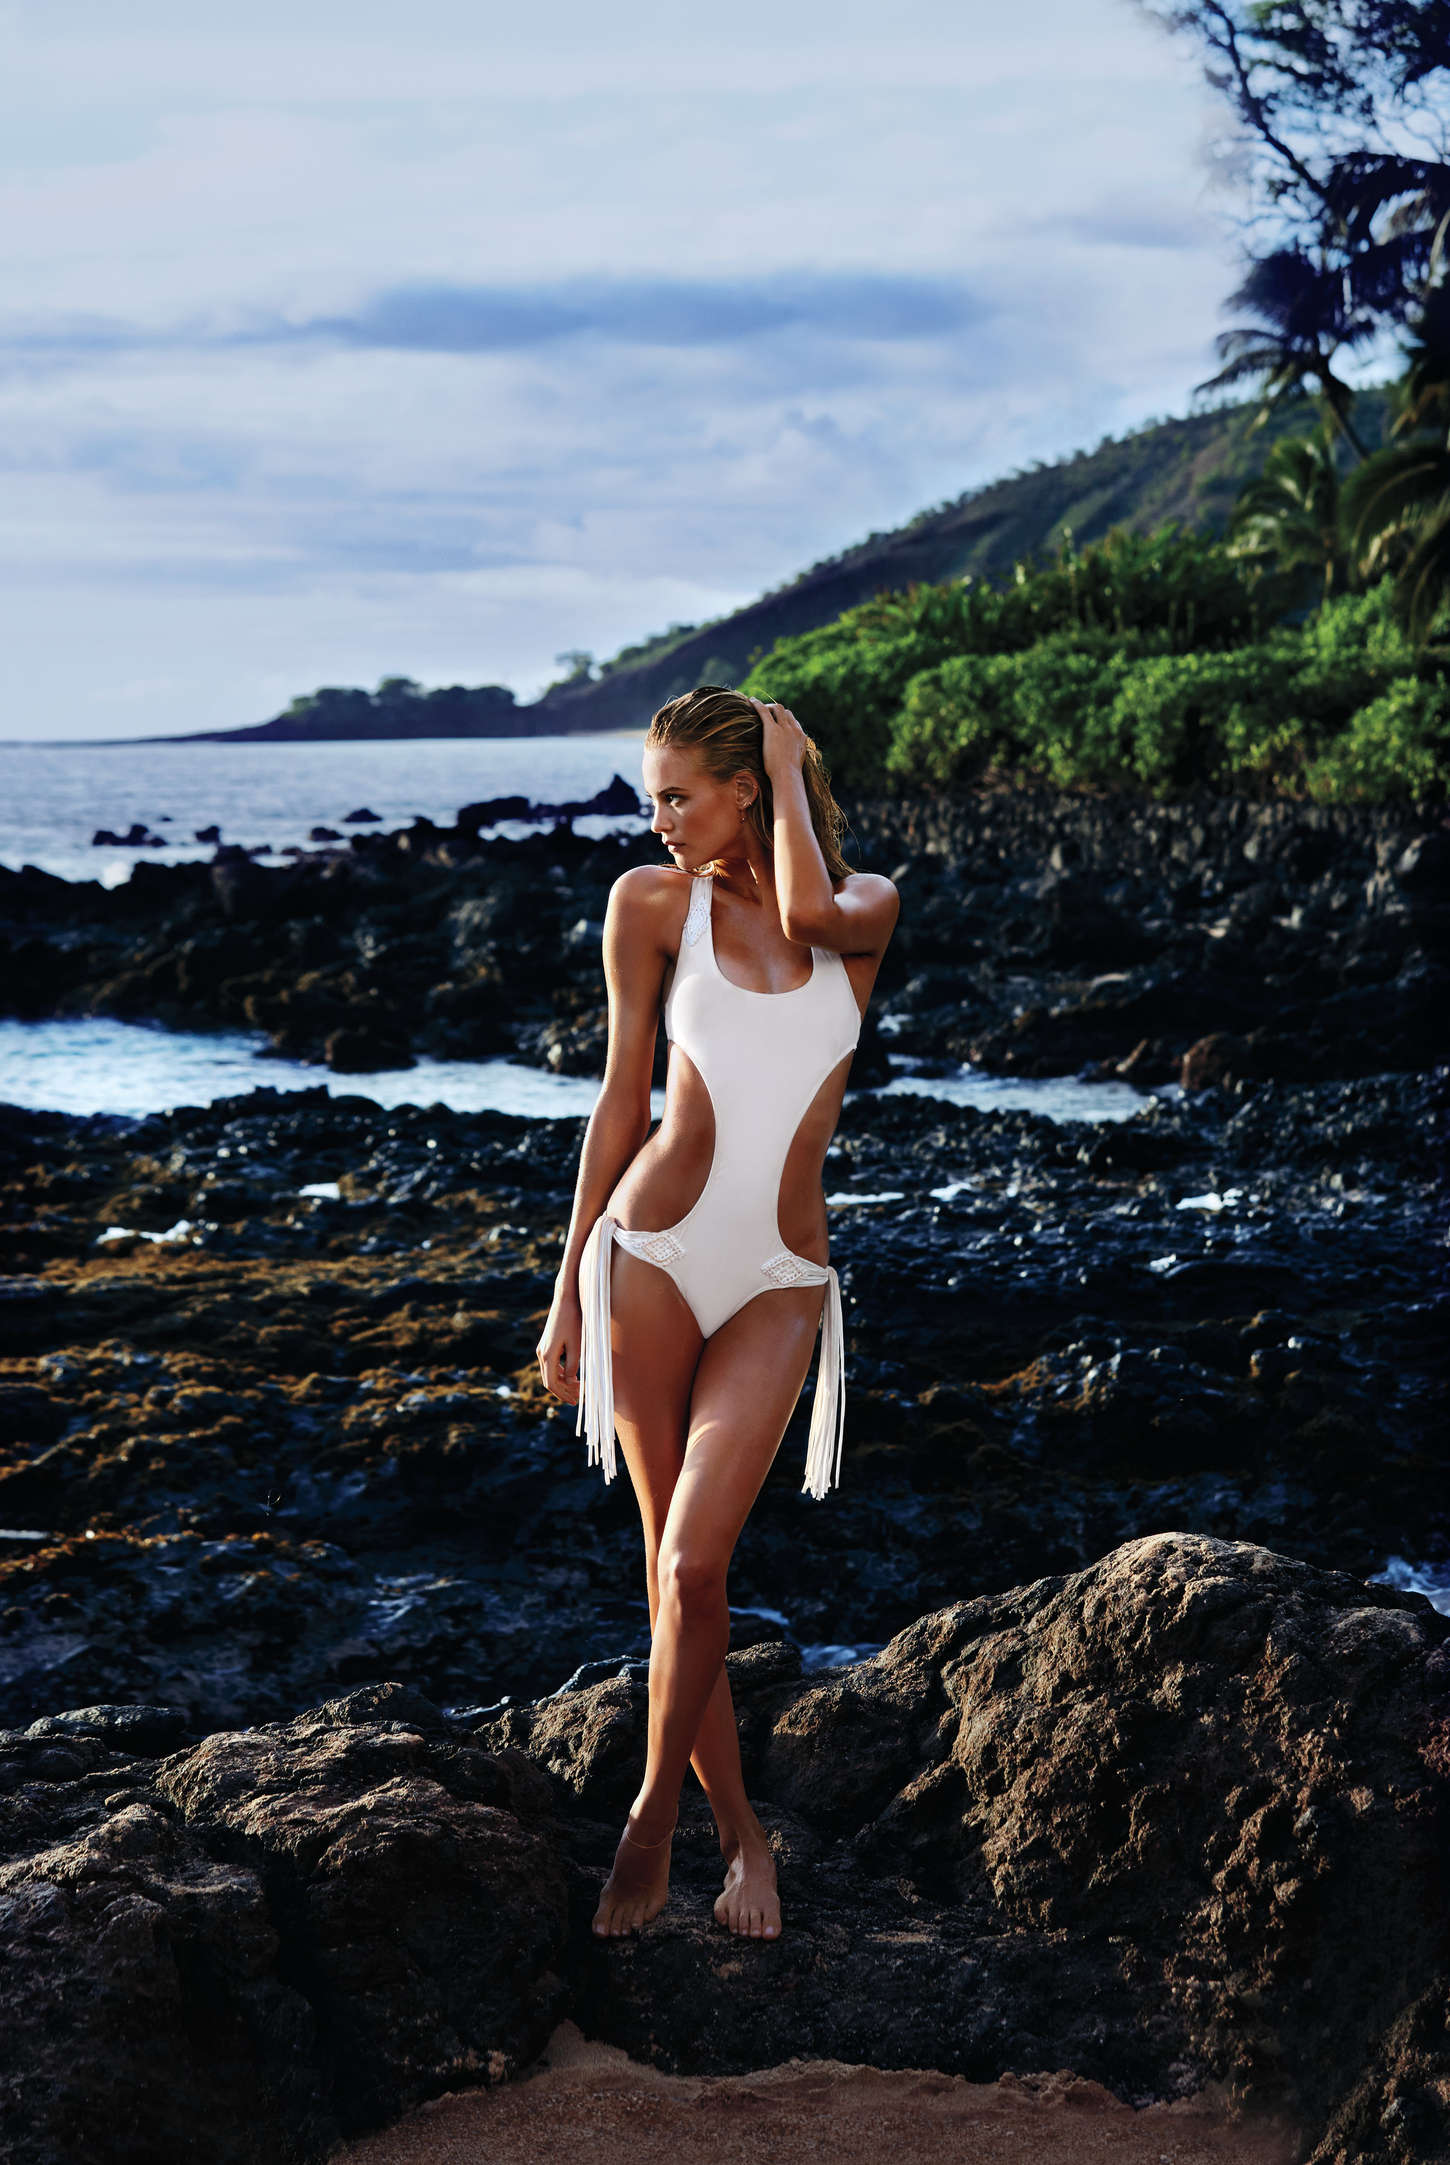 Behati Prinsloo 2015 : Behati Prinsloo: VS Swim Catalog 2015 -18